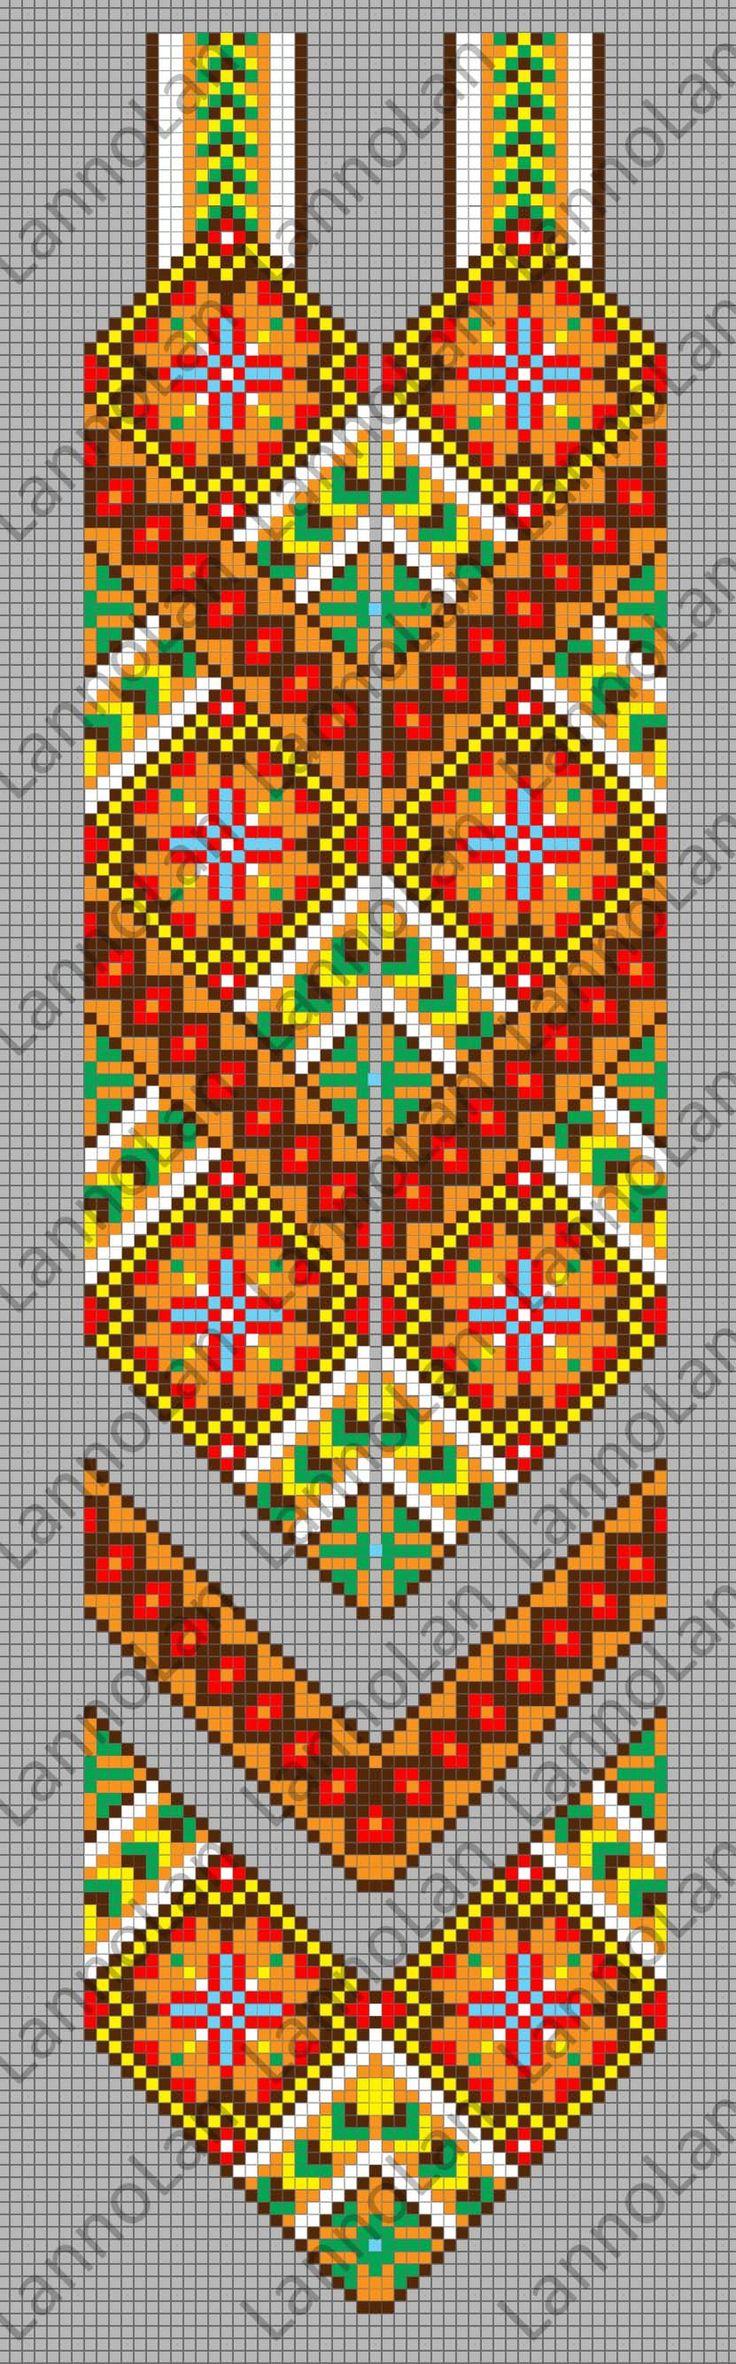 ukraine pattern - gerdan pattern - loom necklace ... inspired by: http://skrynya.ua/ru/etno-stil/etno-gerdany/p596697